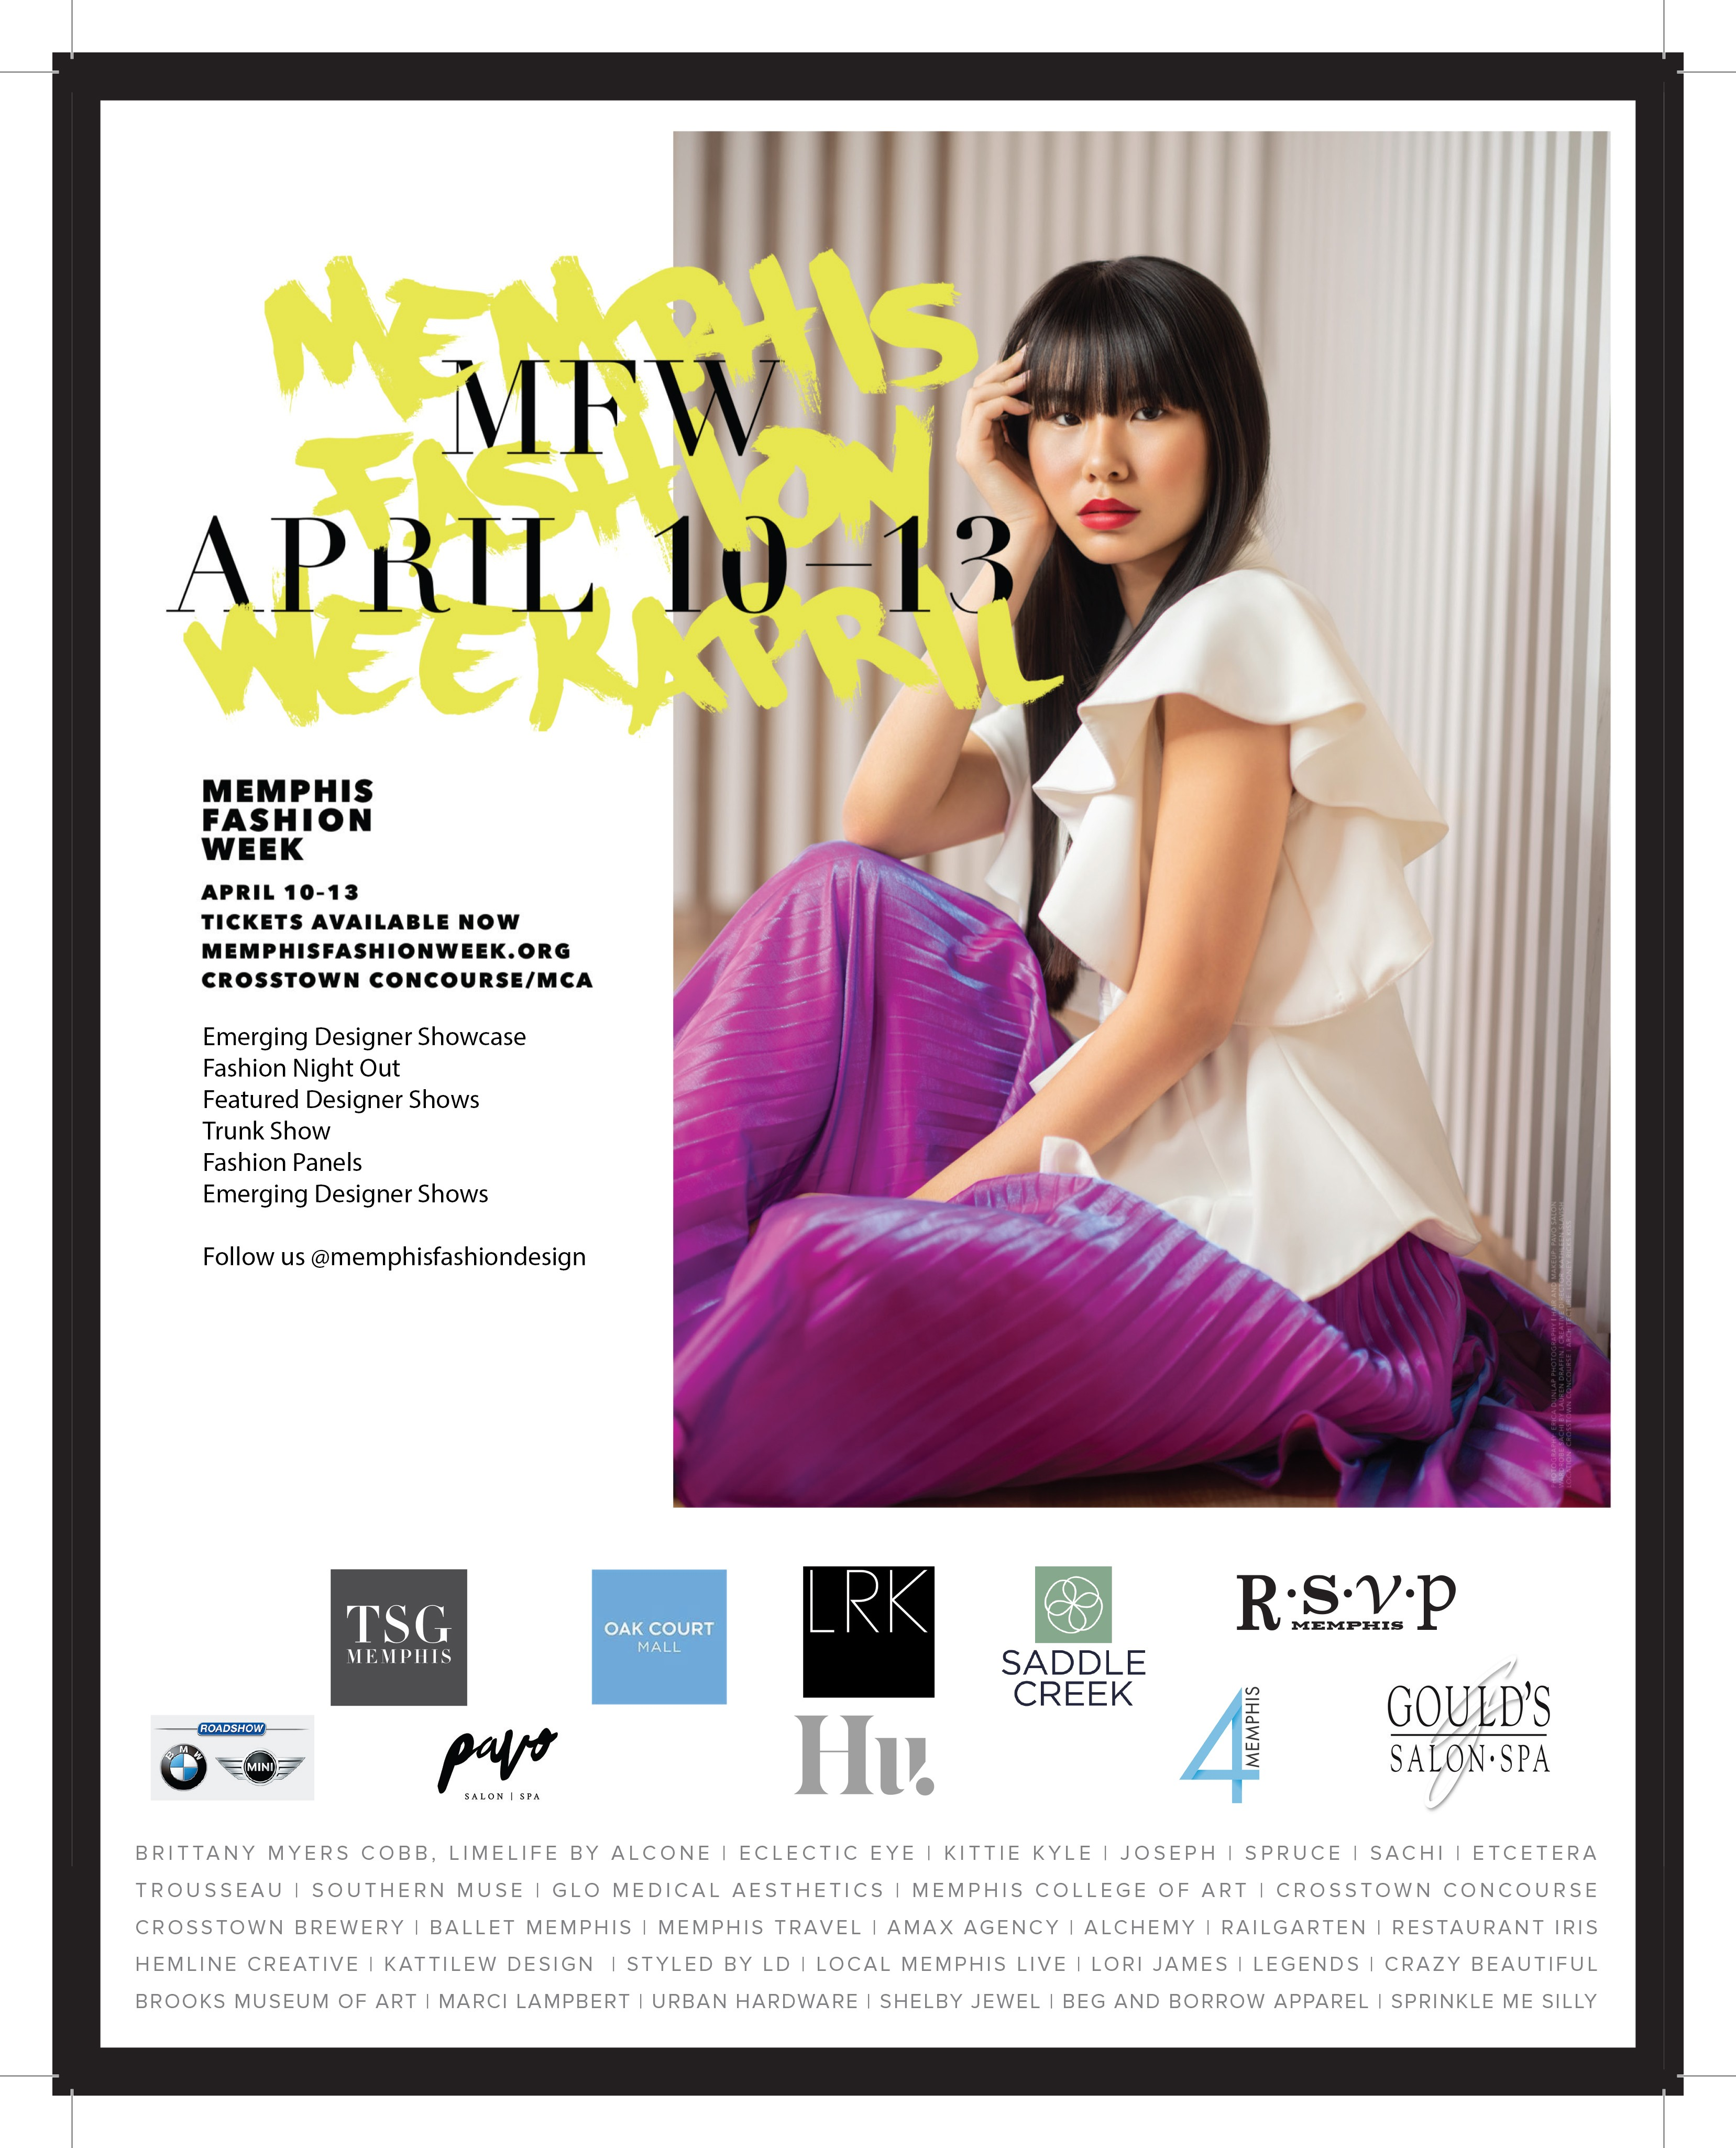 Remarkable Memphis Fashion Week Linkedin Home Interior And Landscaping Ologienasavecom